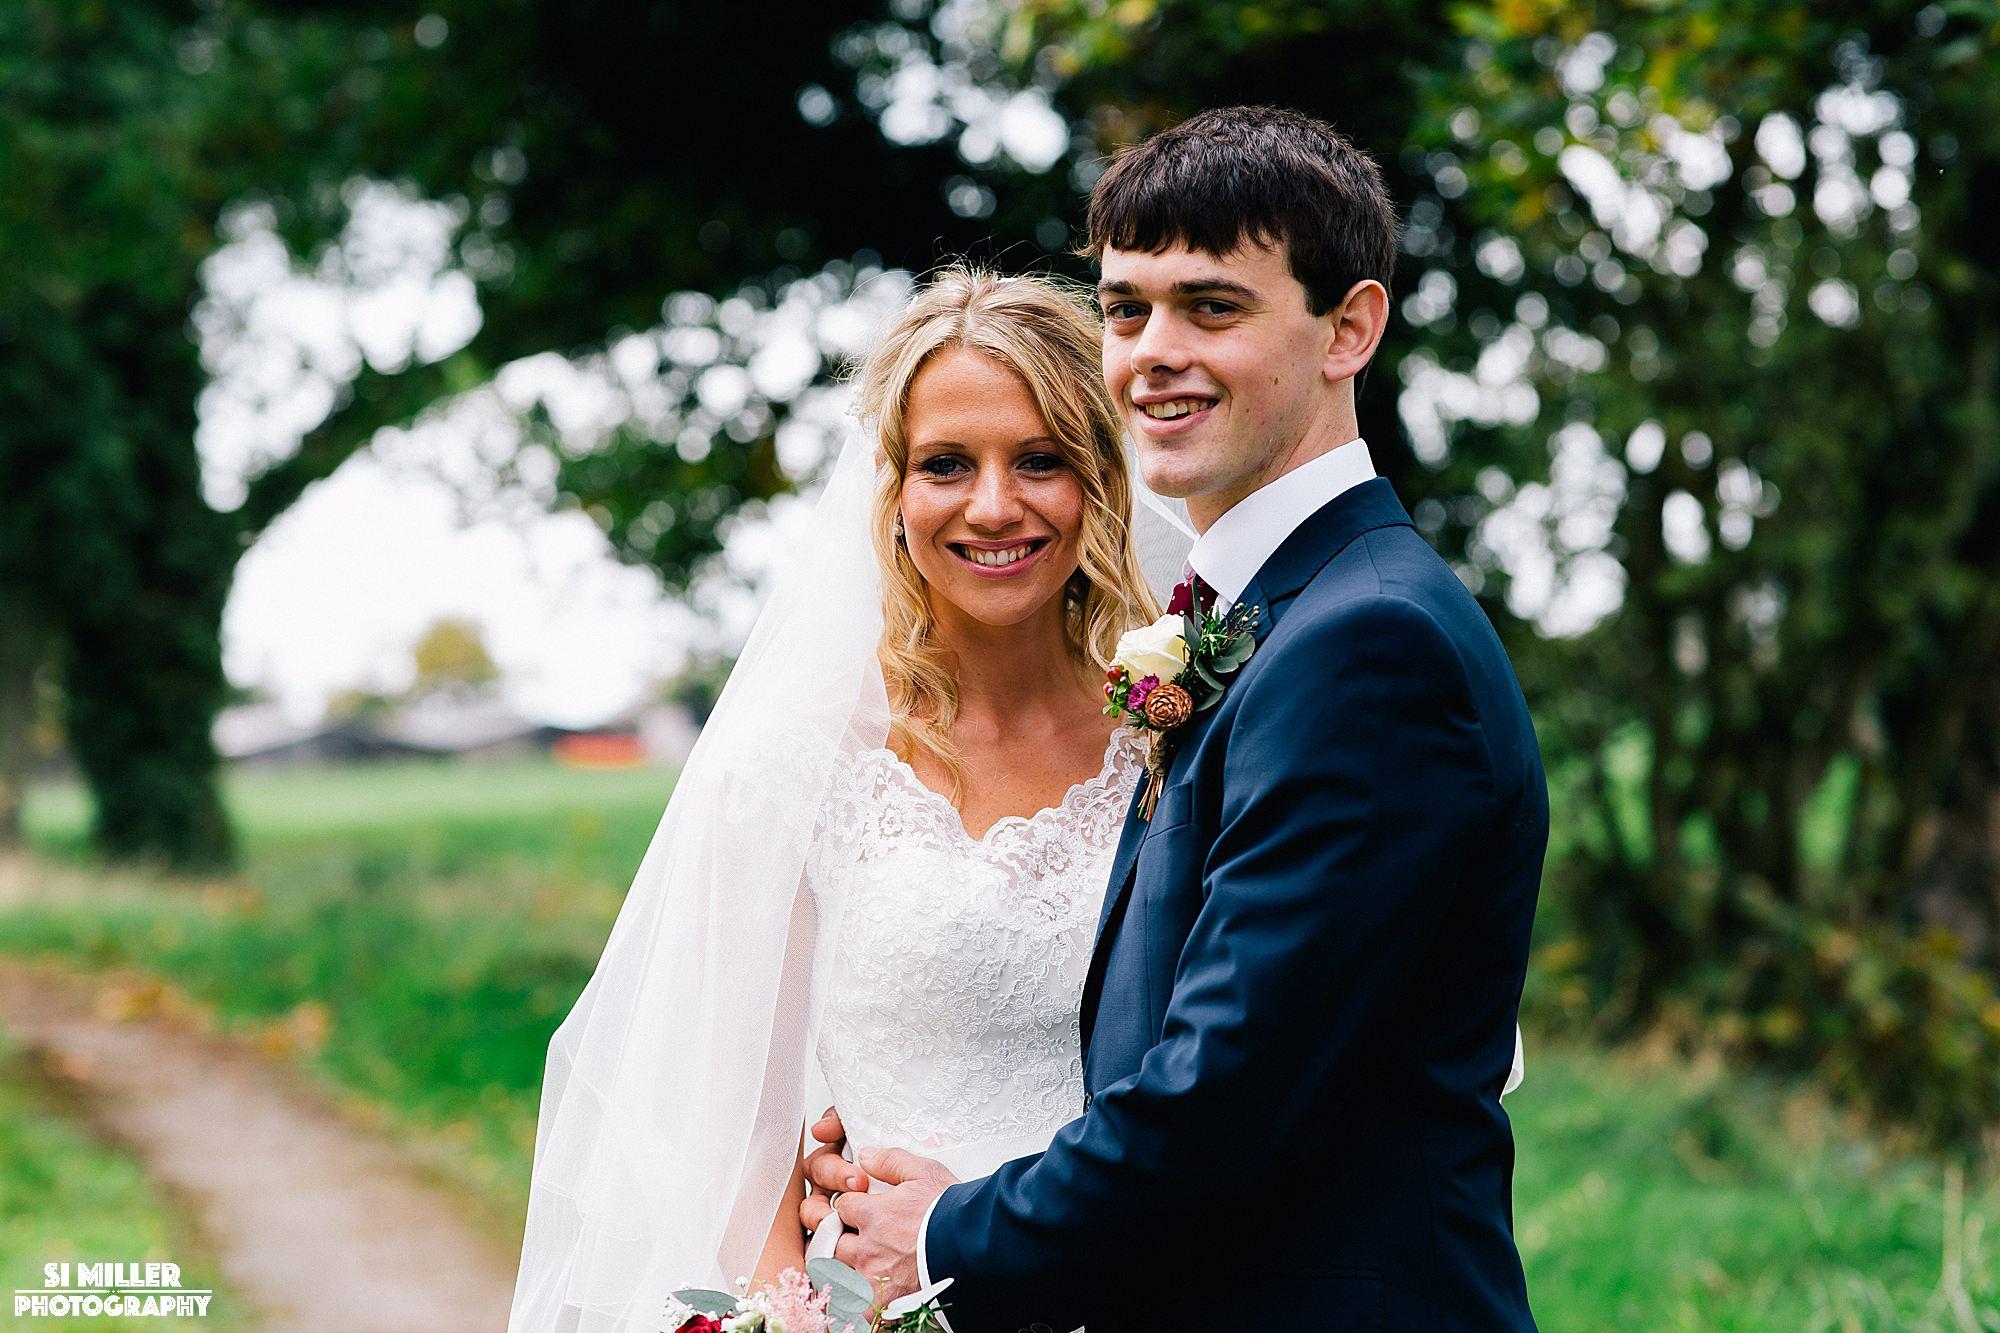 Bride and groom portrait smiling